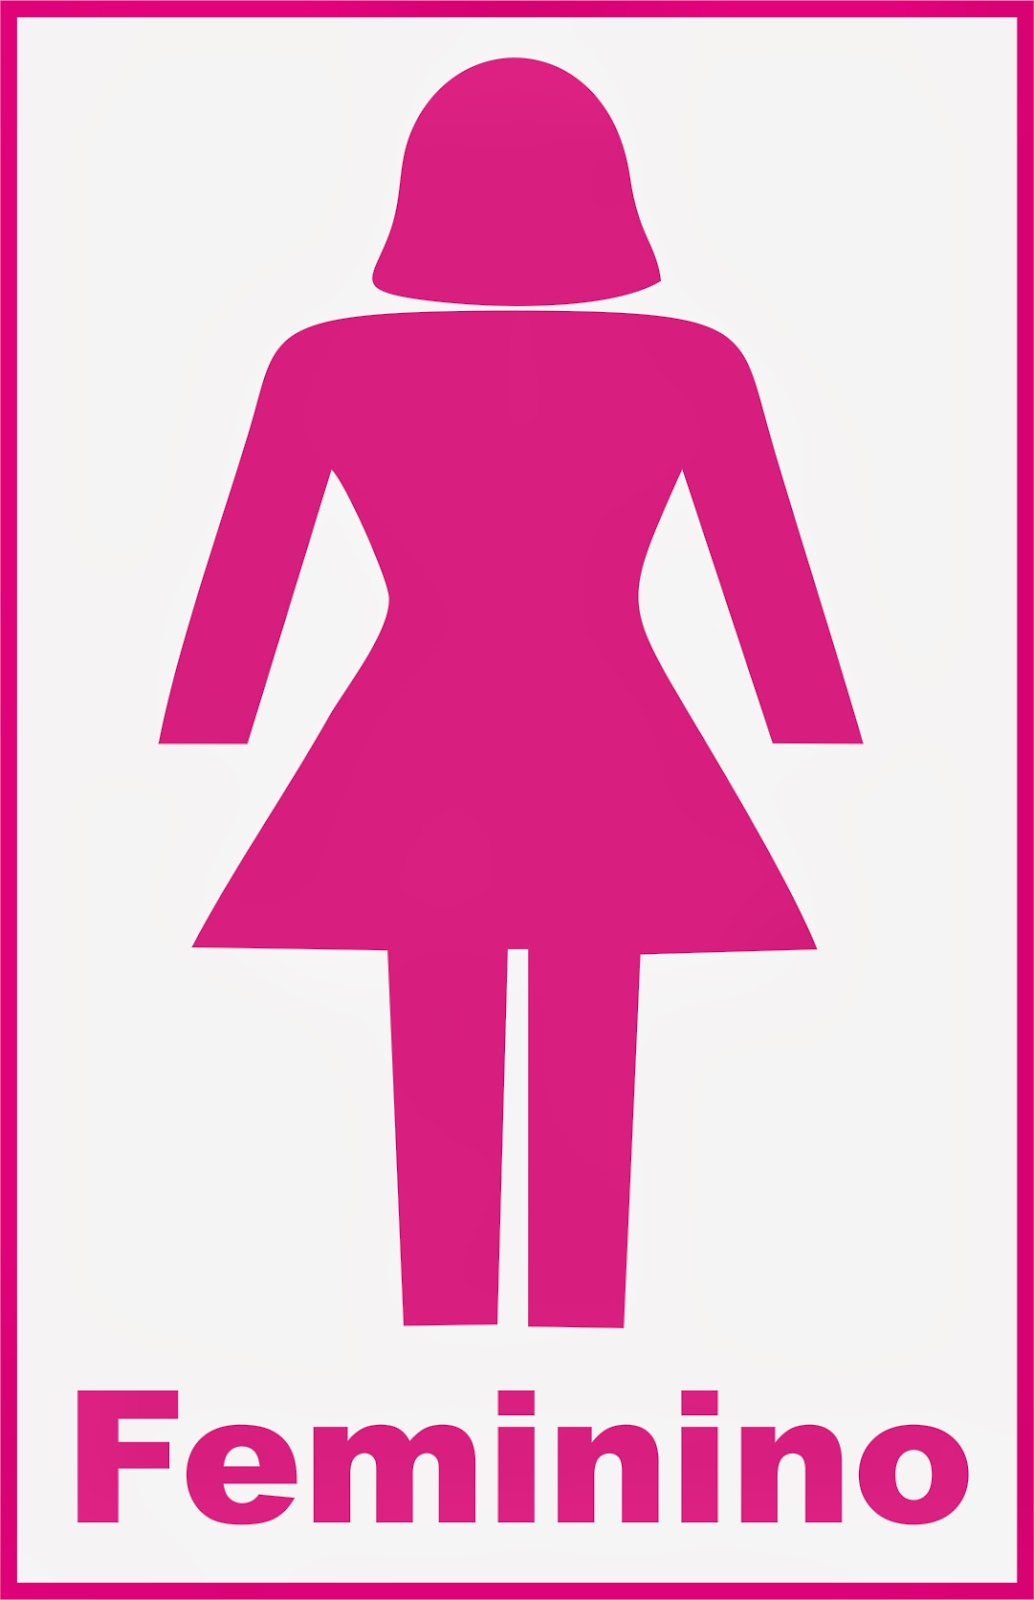 placa banheiro feminino -> Banheiro Feminino Placa